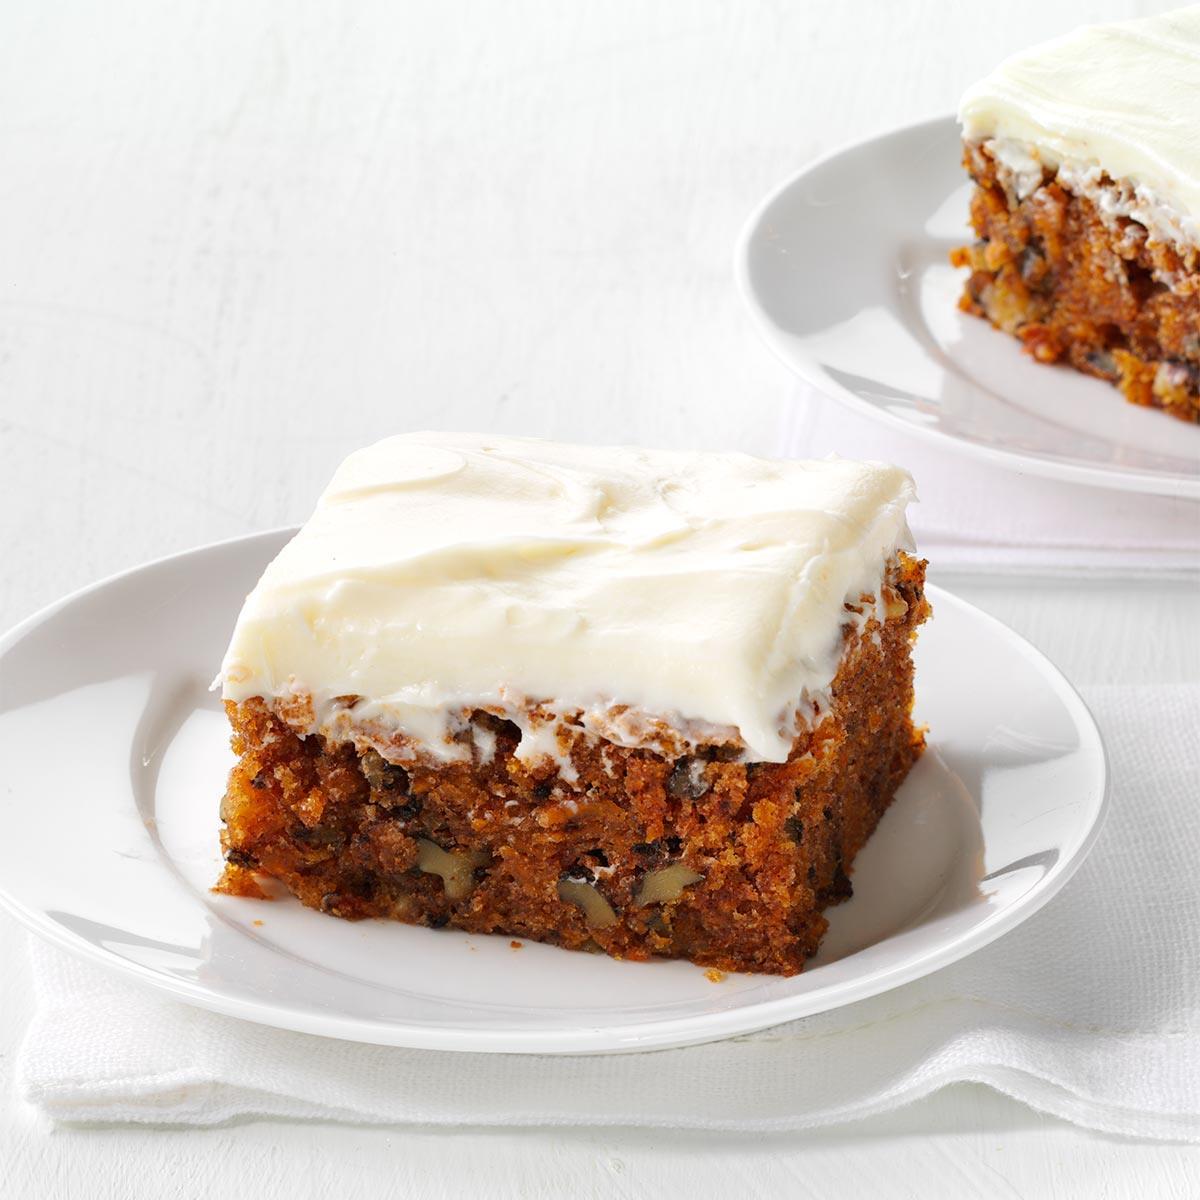 Billie's Southern Sweet Potato Cake image